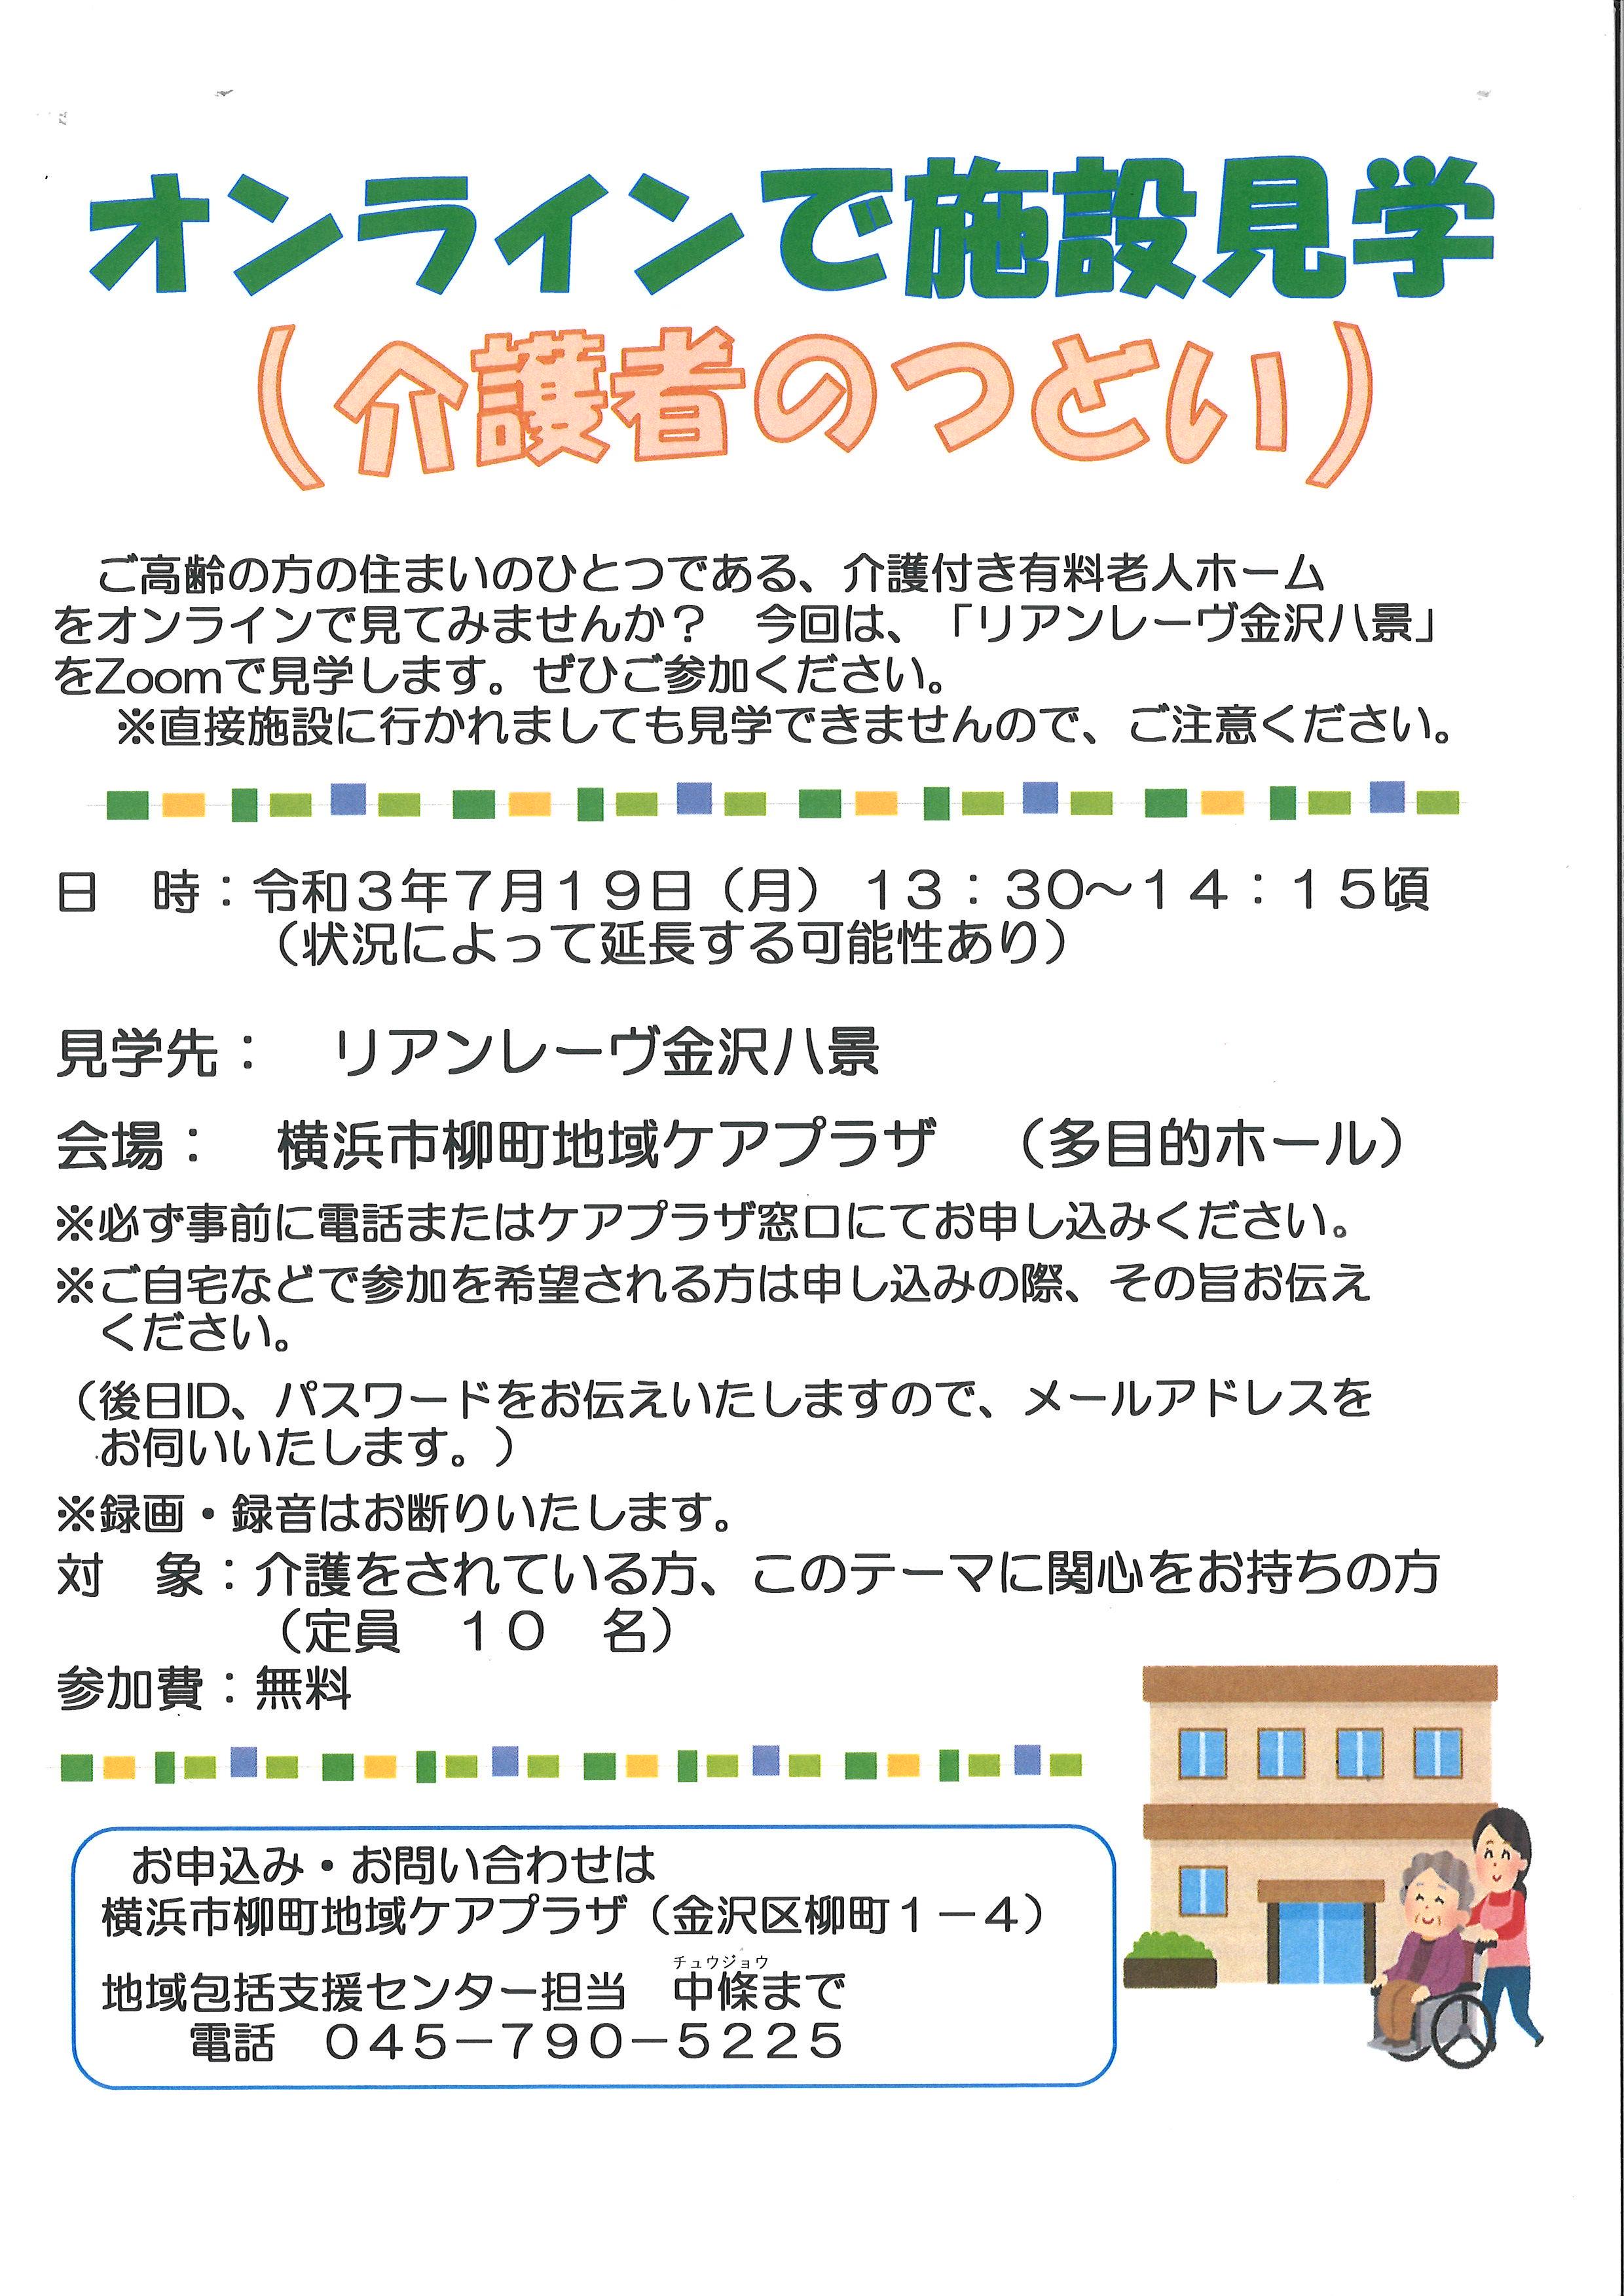 https://www.suminasu.or.jp/global-data/20210621154735233.jpg